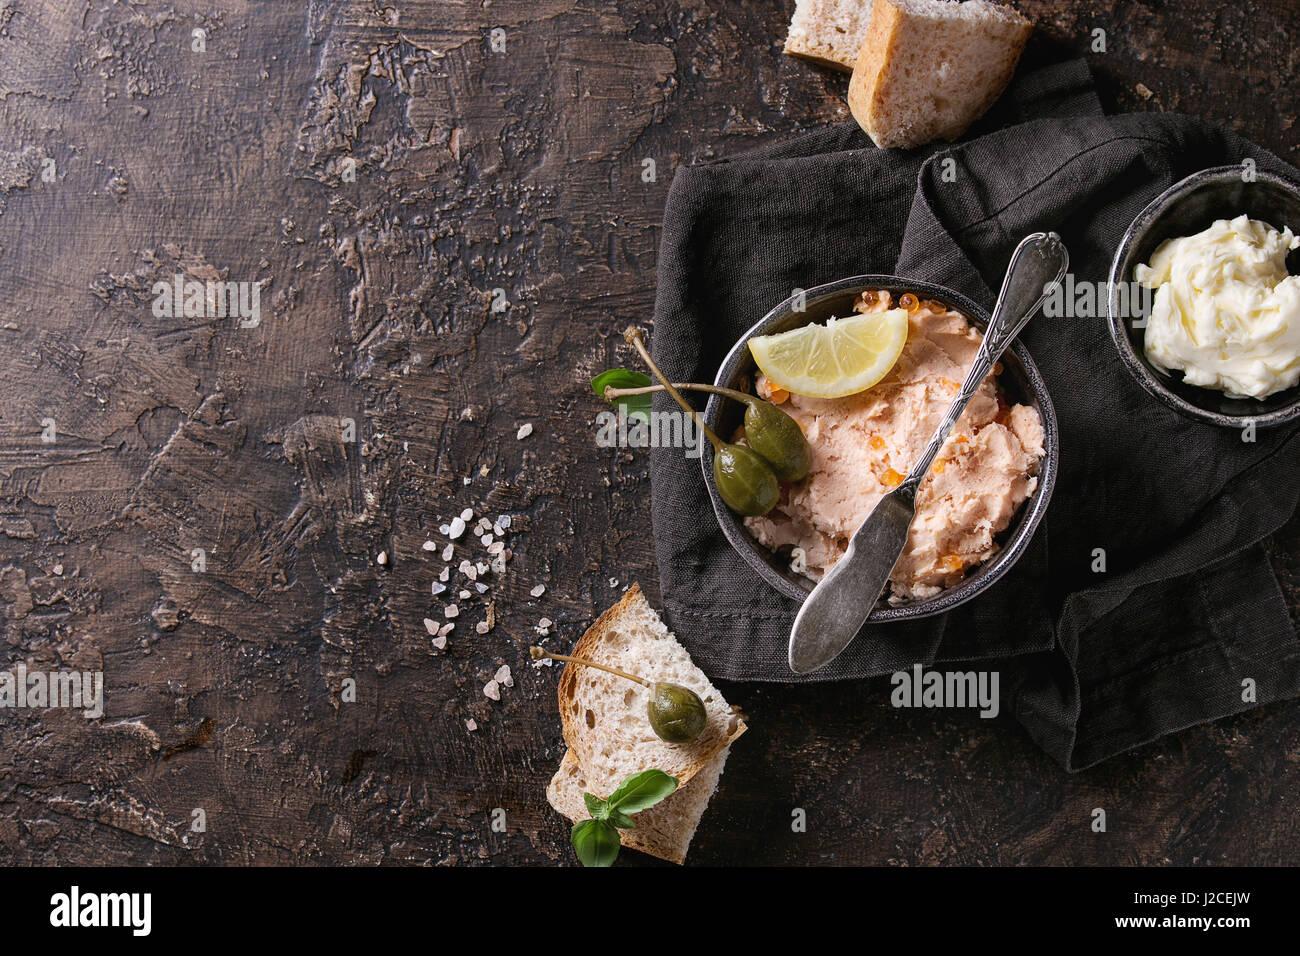 Salmon pate with red caviar - Stock Image